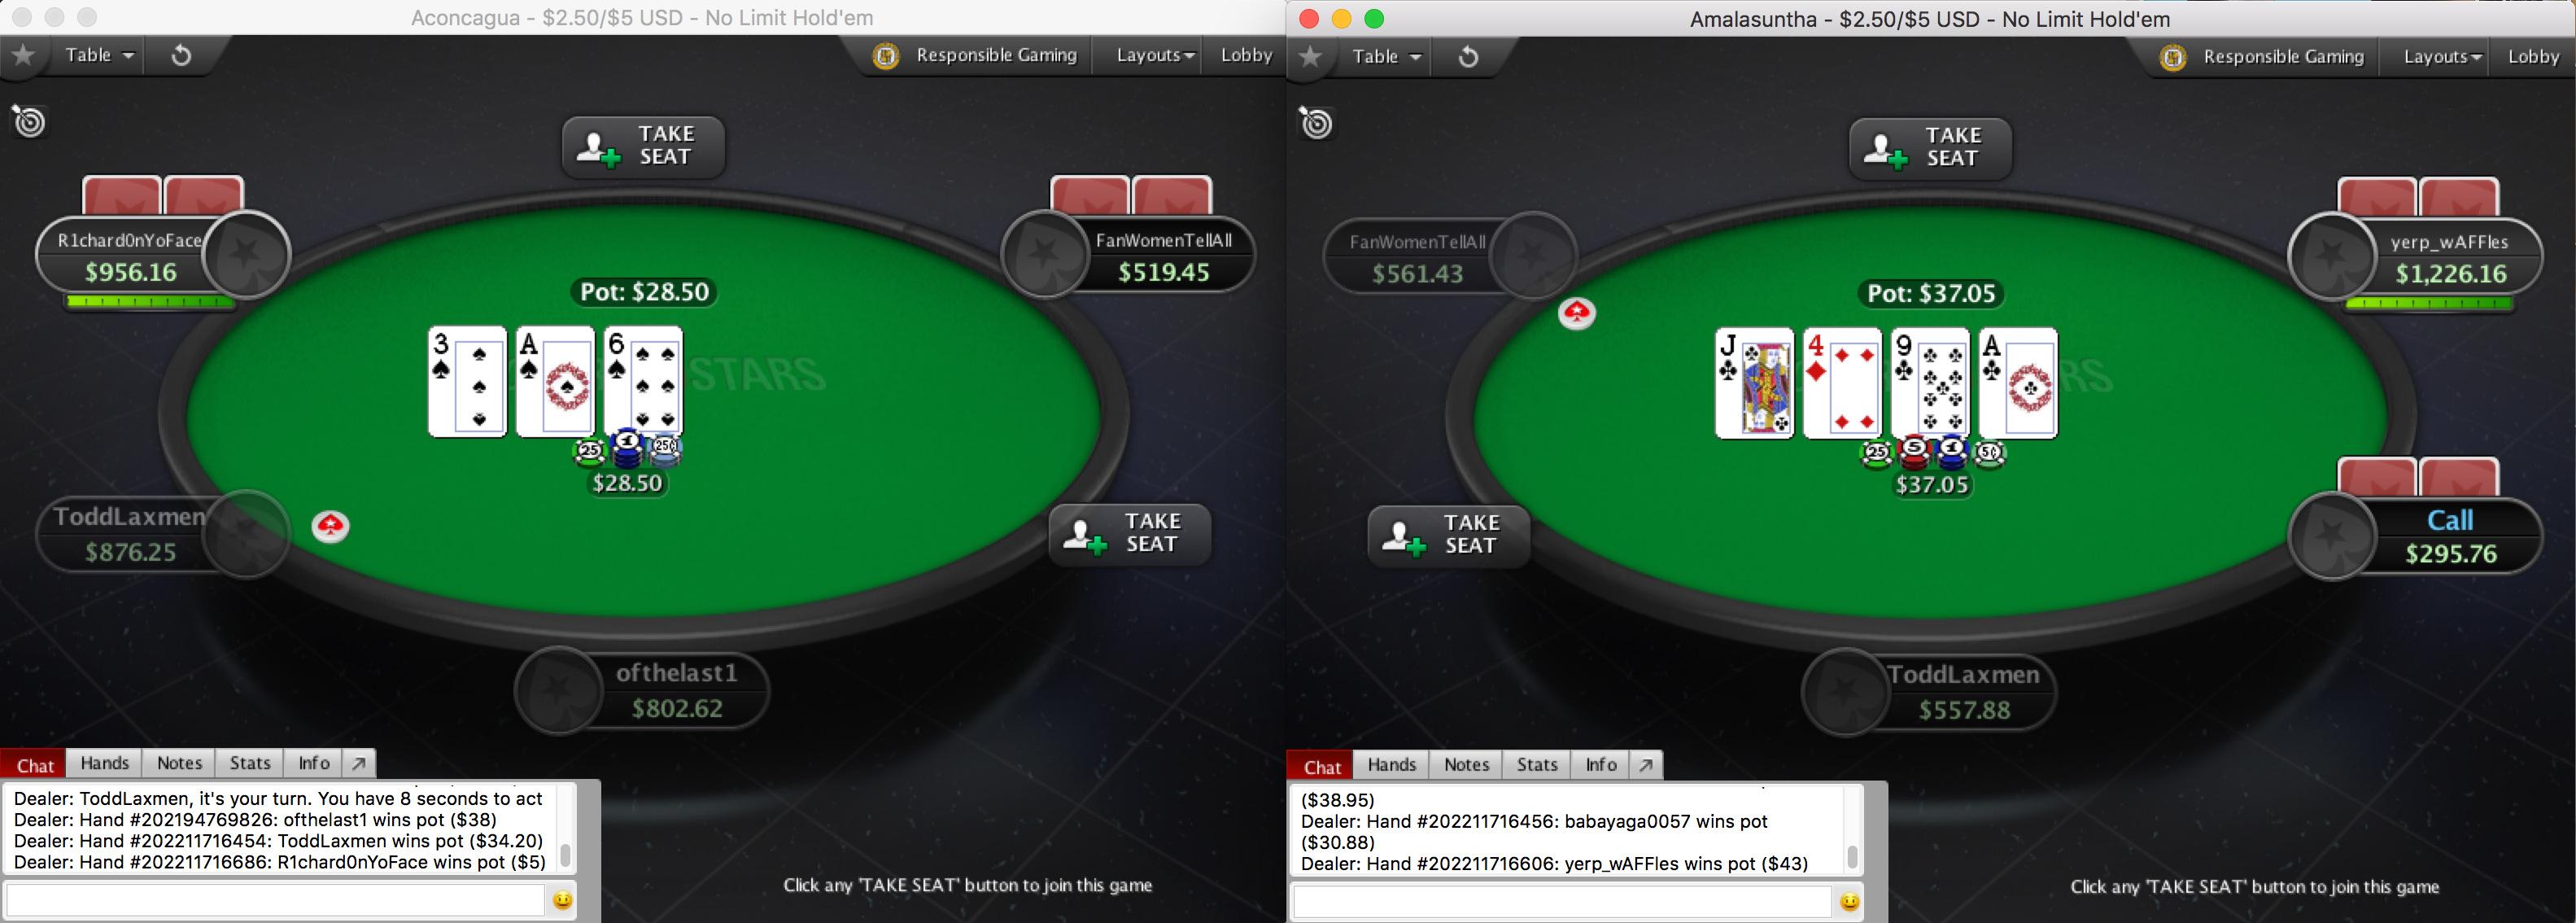 Pokerstars Live Blog